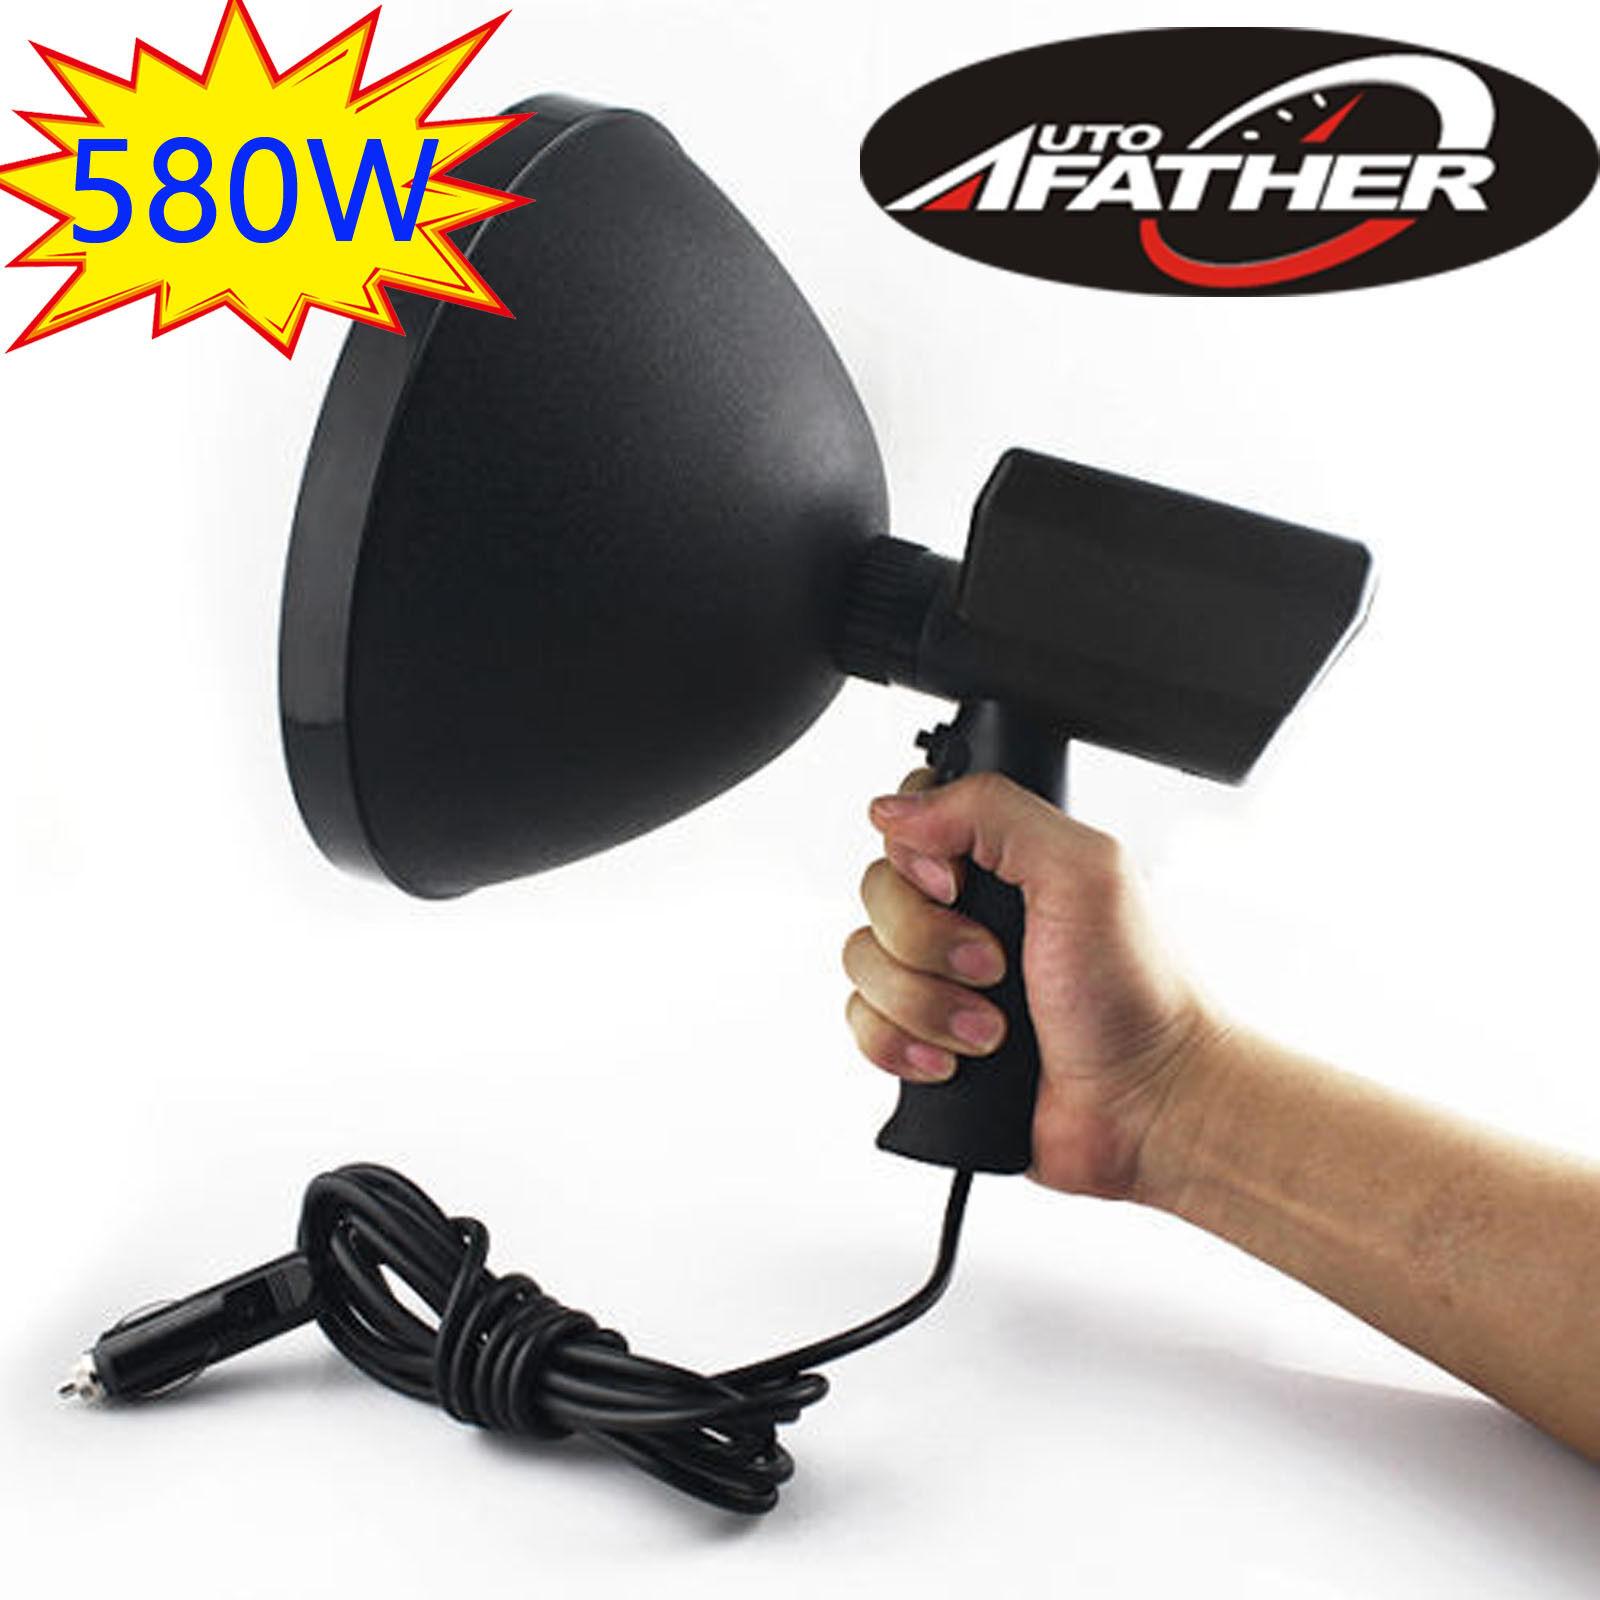 9 Inch 580W 12V HandHeld HID Spotlight Driving Lights Hunting Search light 6000K